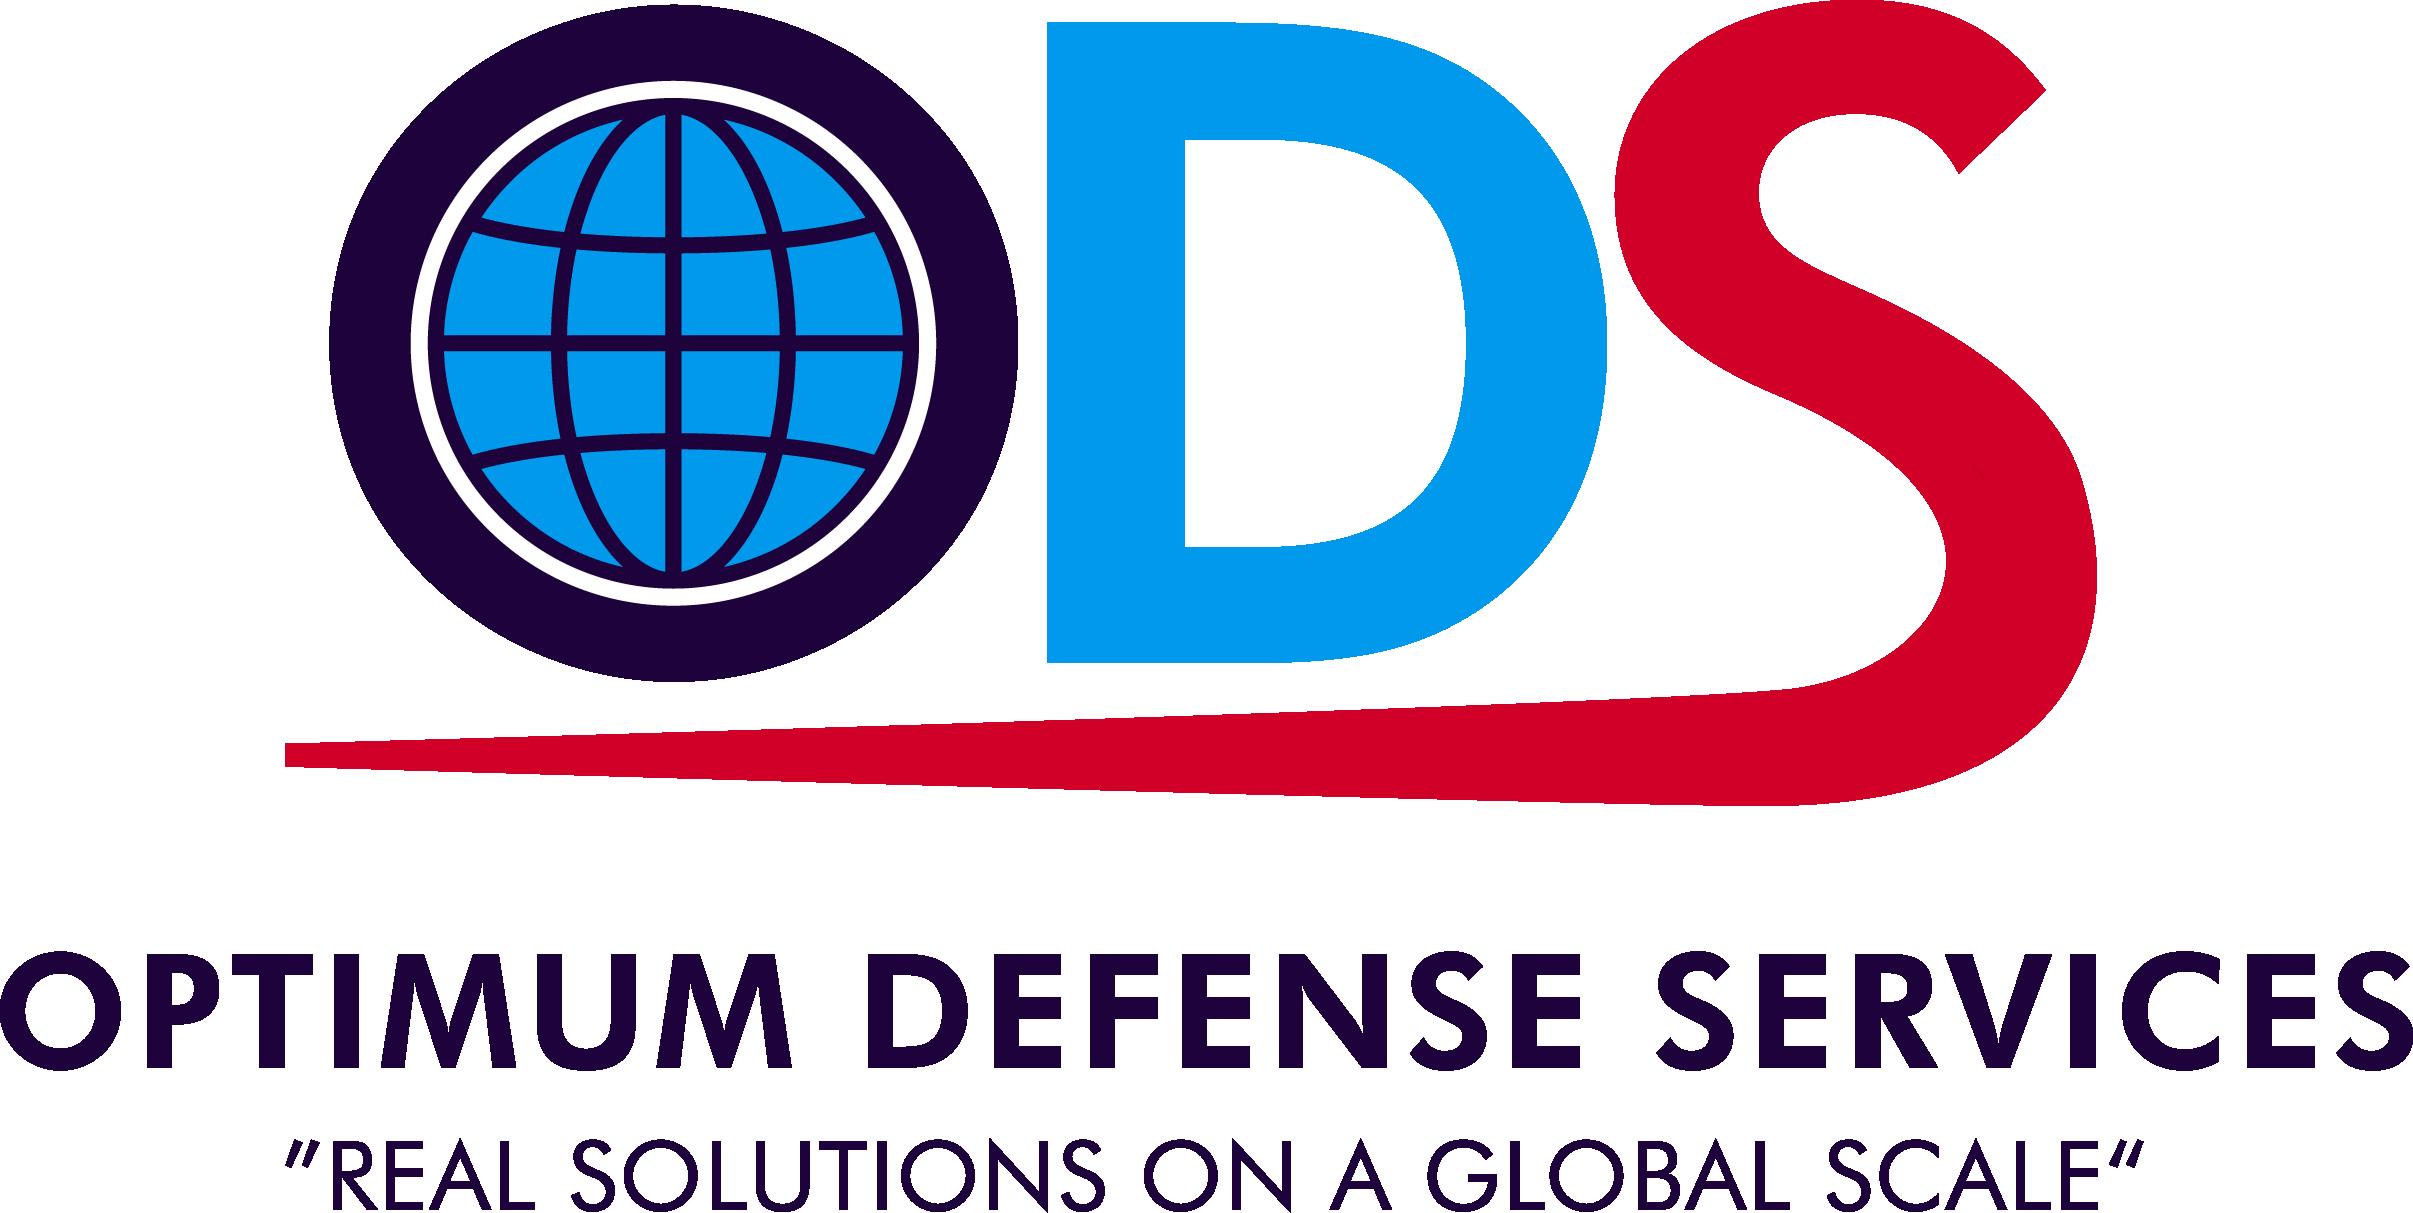 ods-logos-final